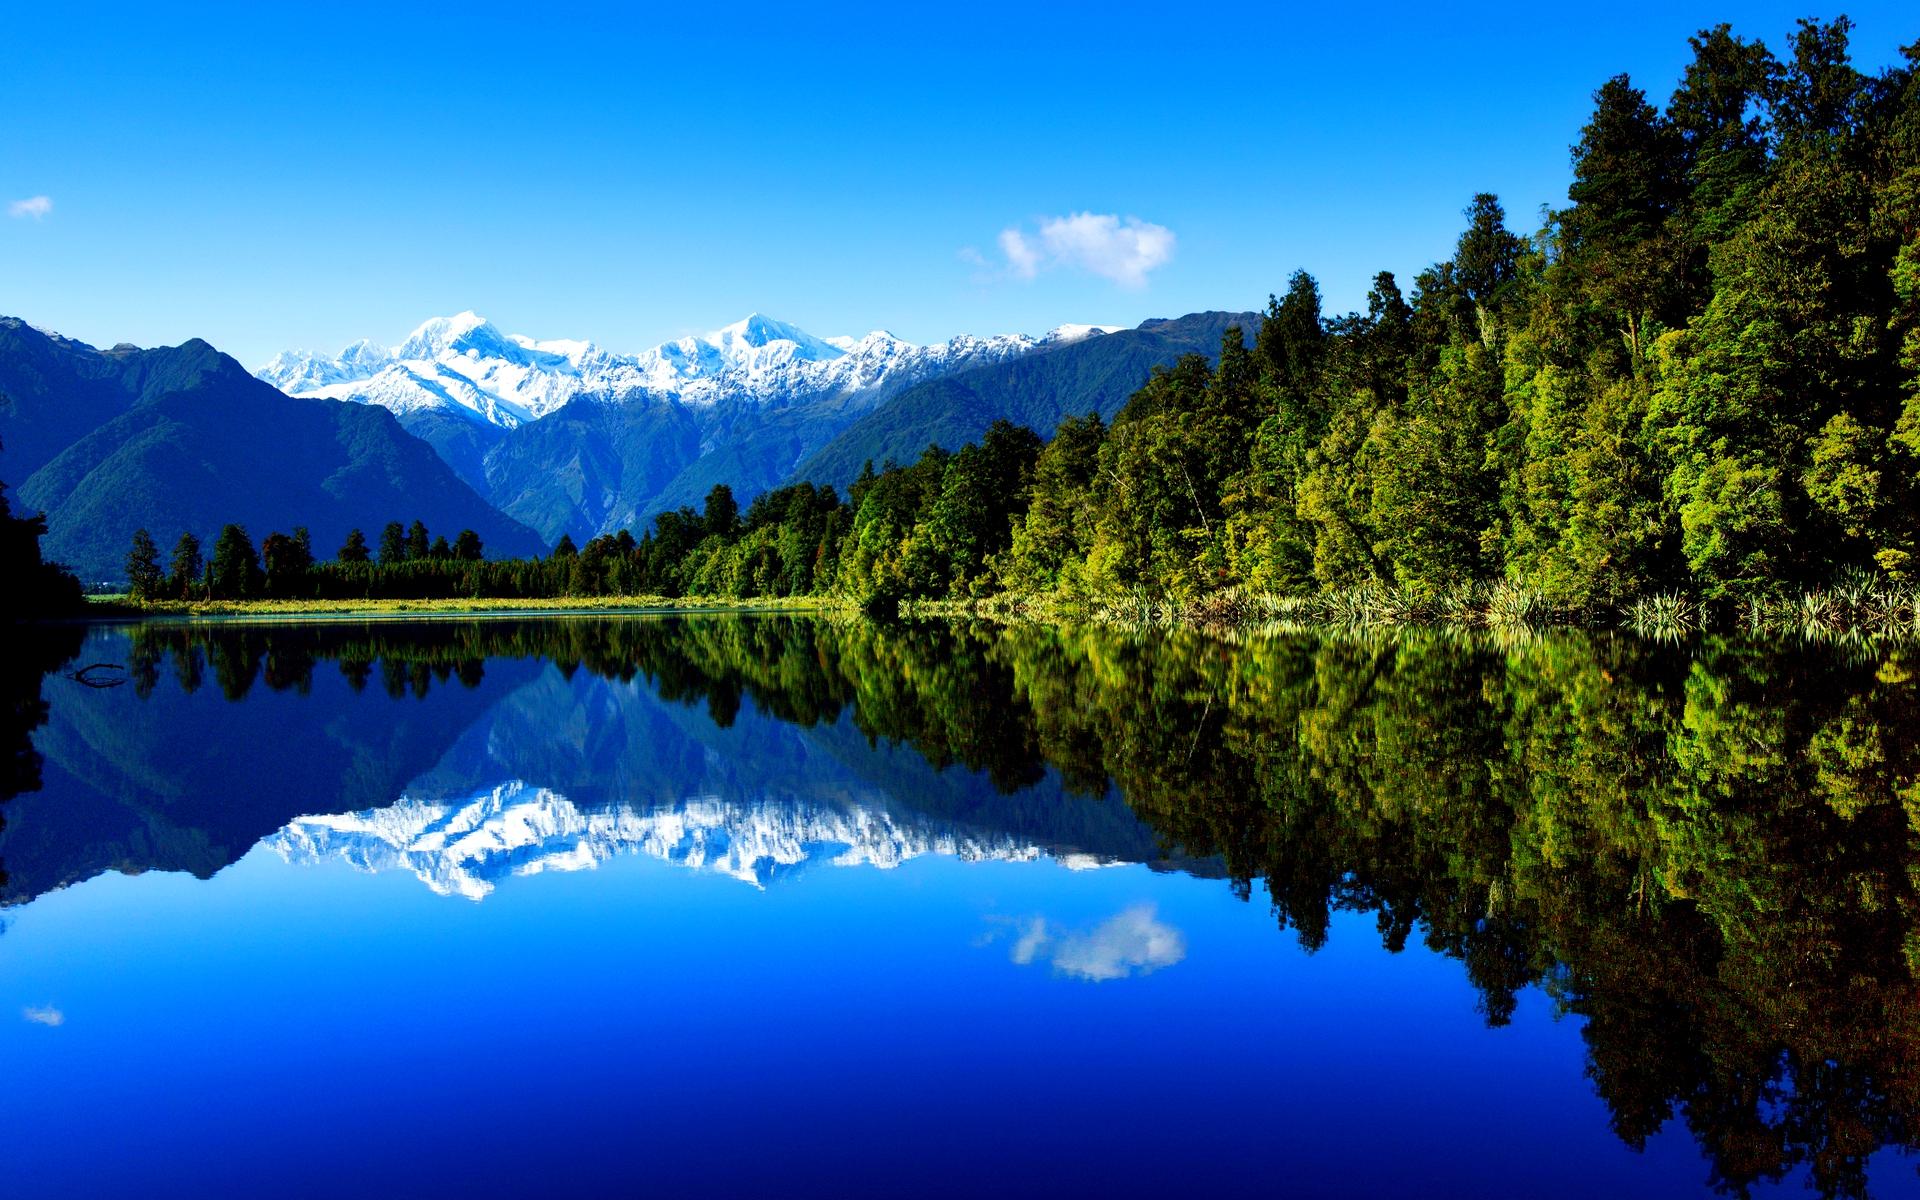 Related For Mushroom Lake Reflection Artwork. Lake Reflection